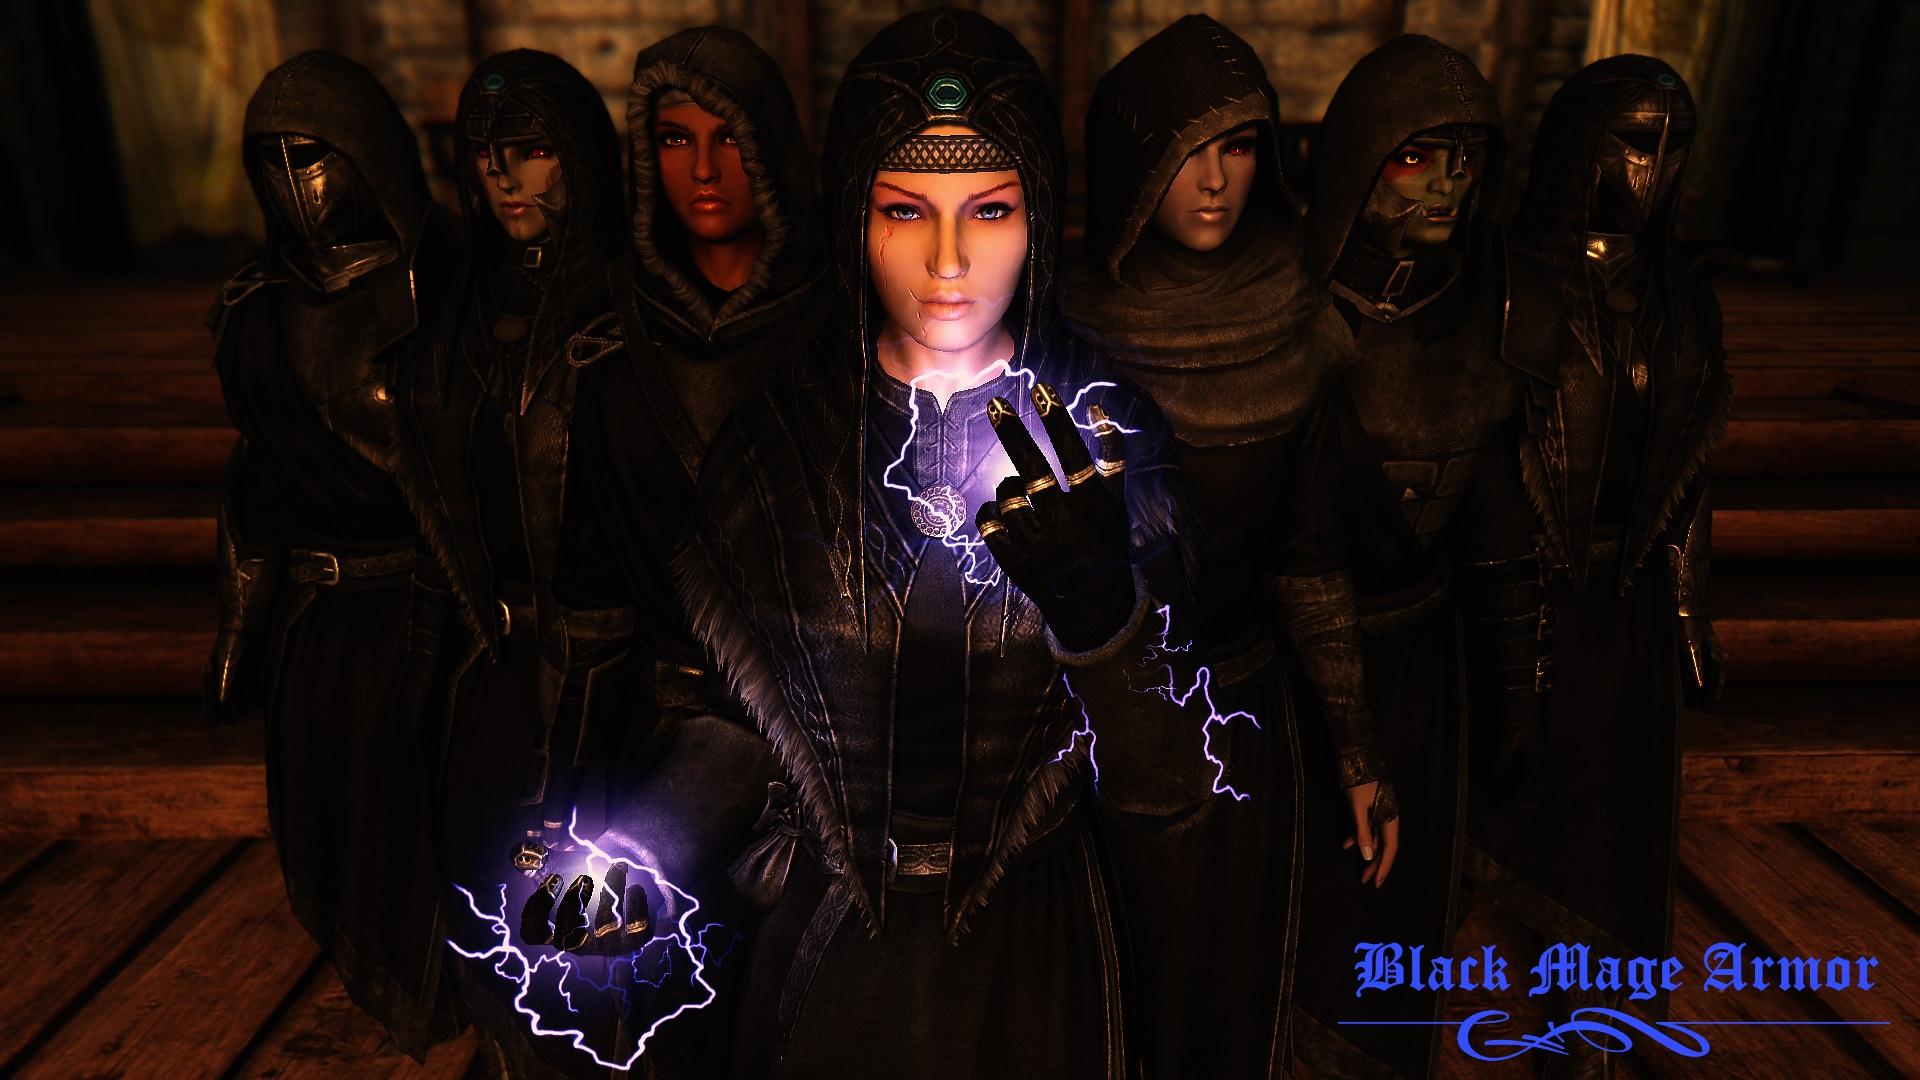 Black_Mage_Armor.jpg